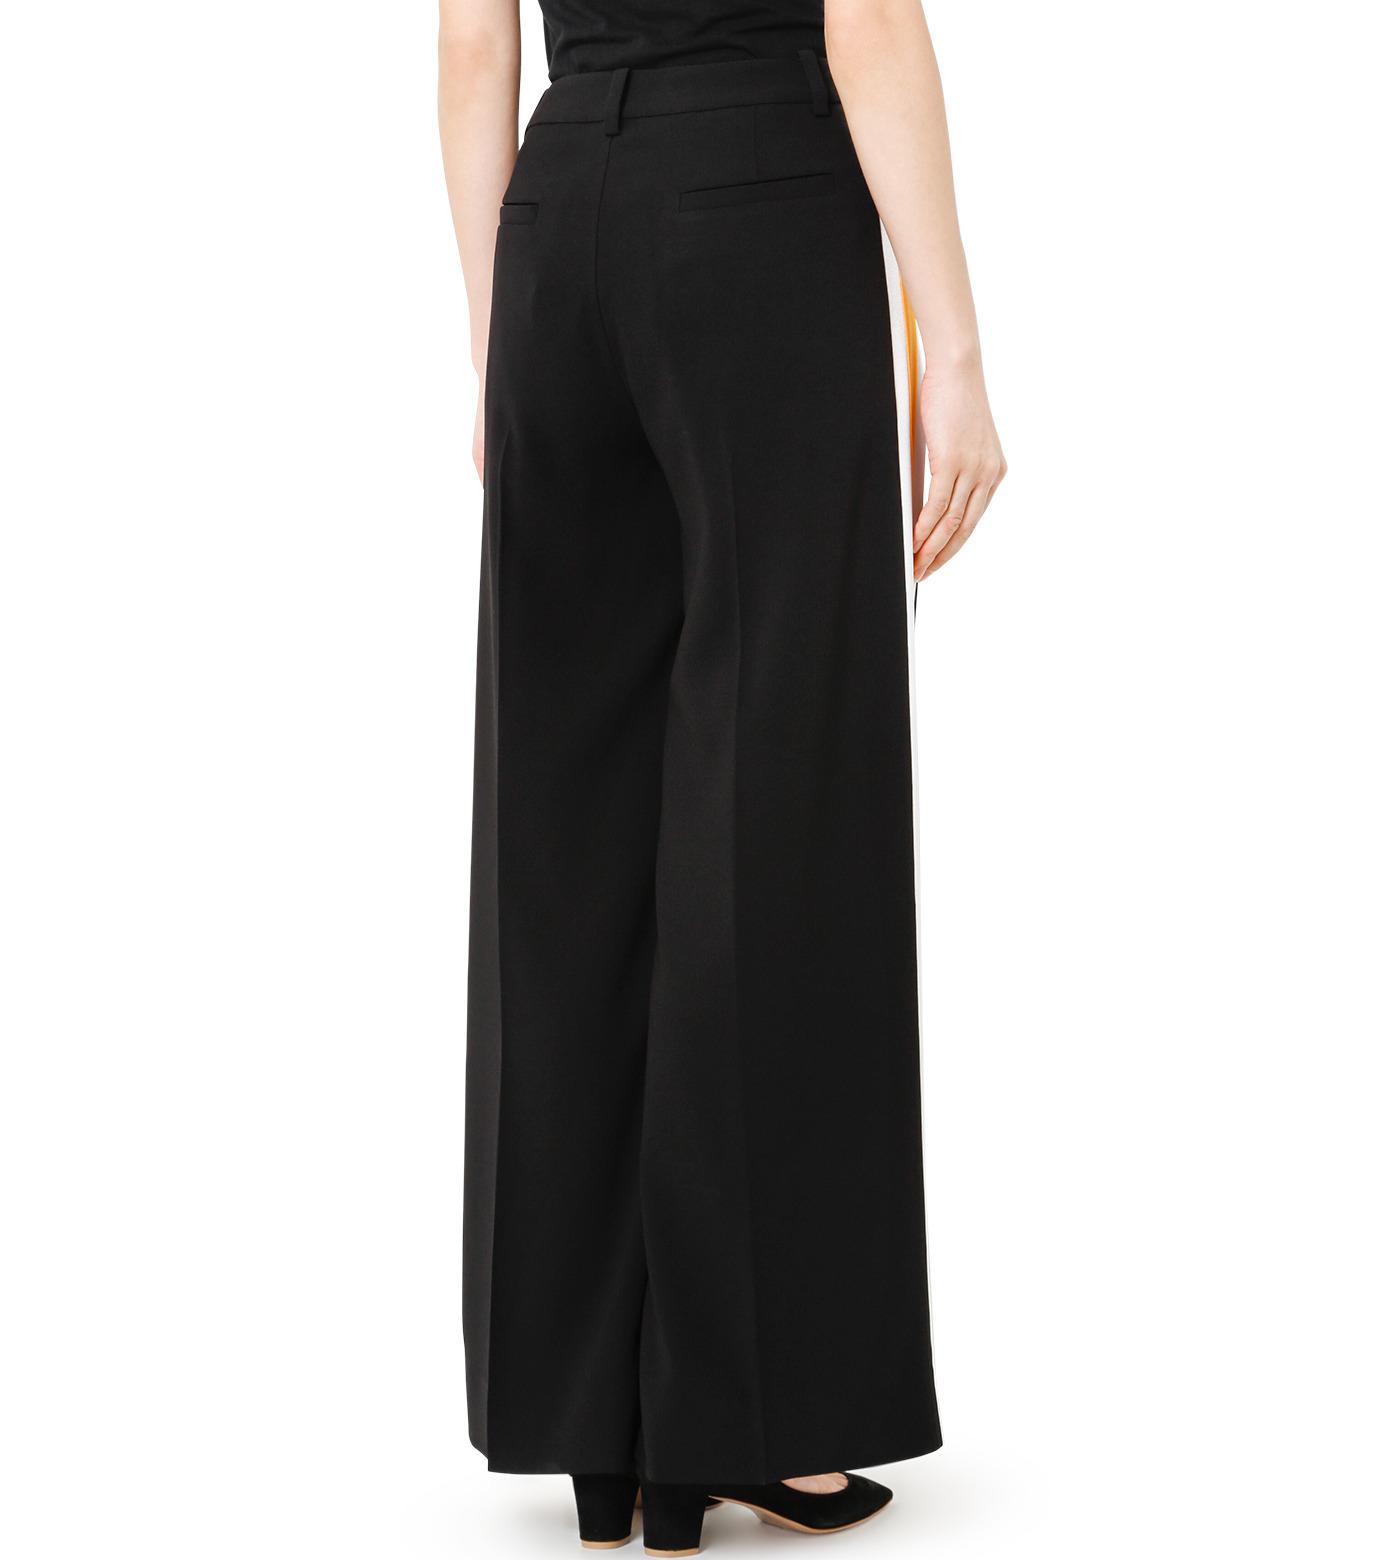 LE CIEL BLEU(ルシェルブルー)のトラックワイドパンツ-BLACK(パンツ/pants)-19S68103 拡大詳細画像4